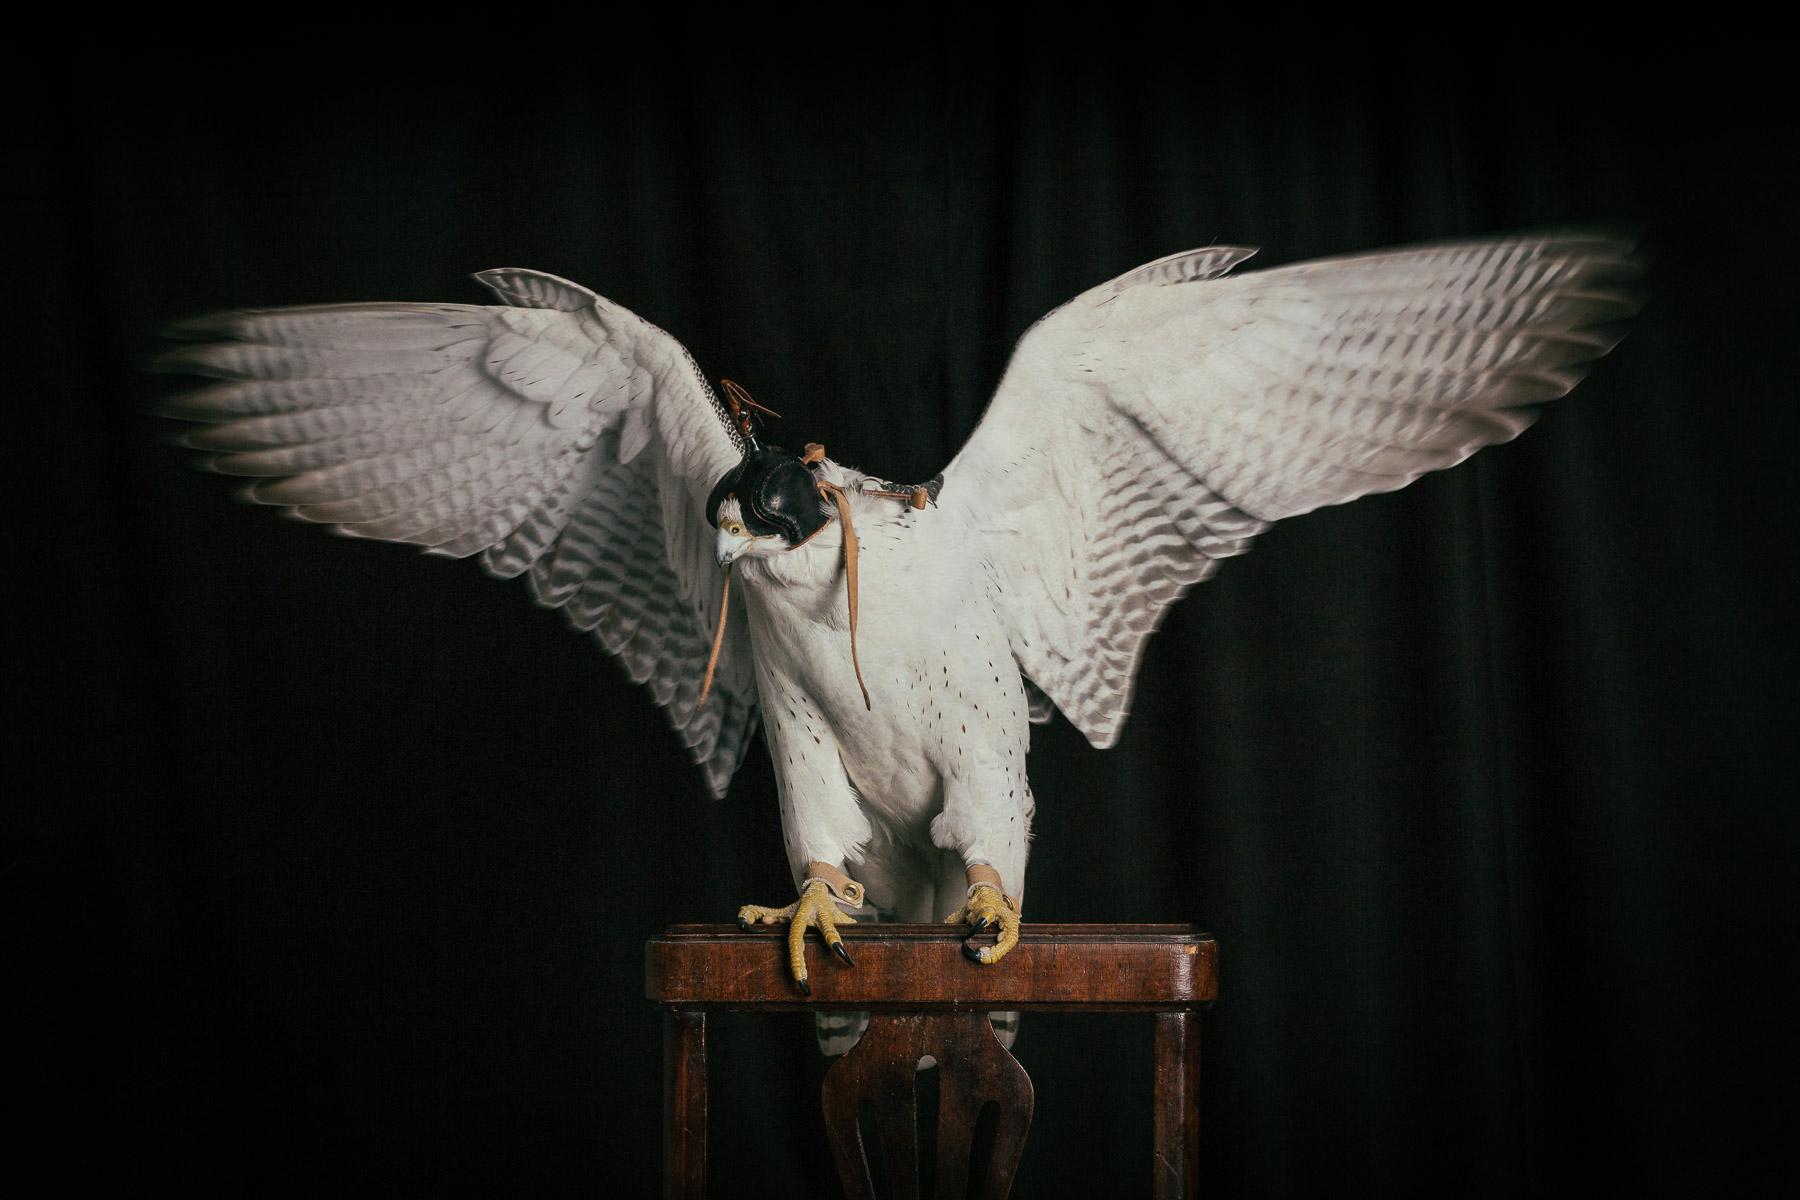 hawk-with-open-wings-animal-photographer.jpg